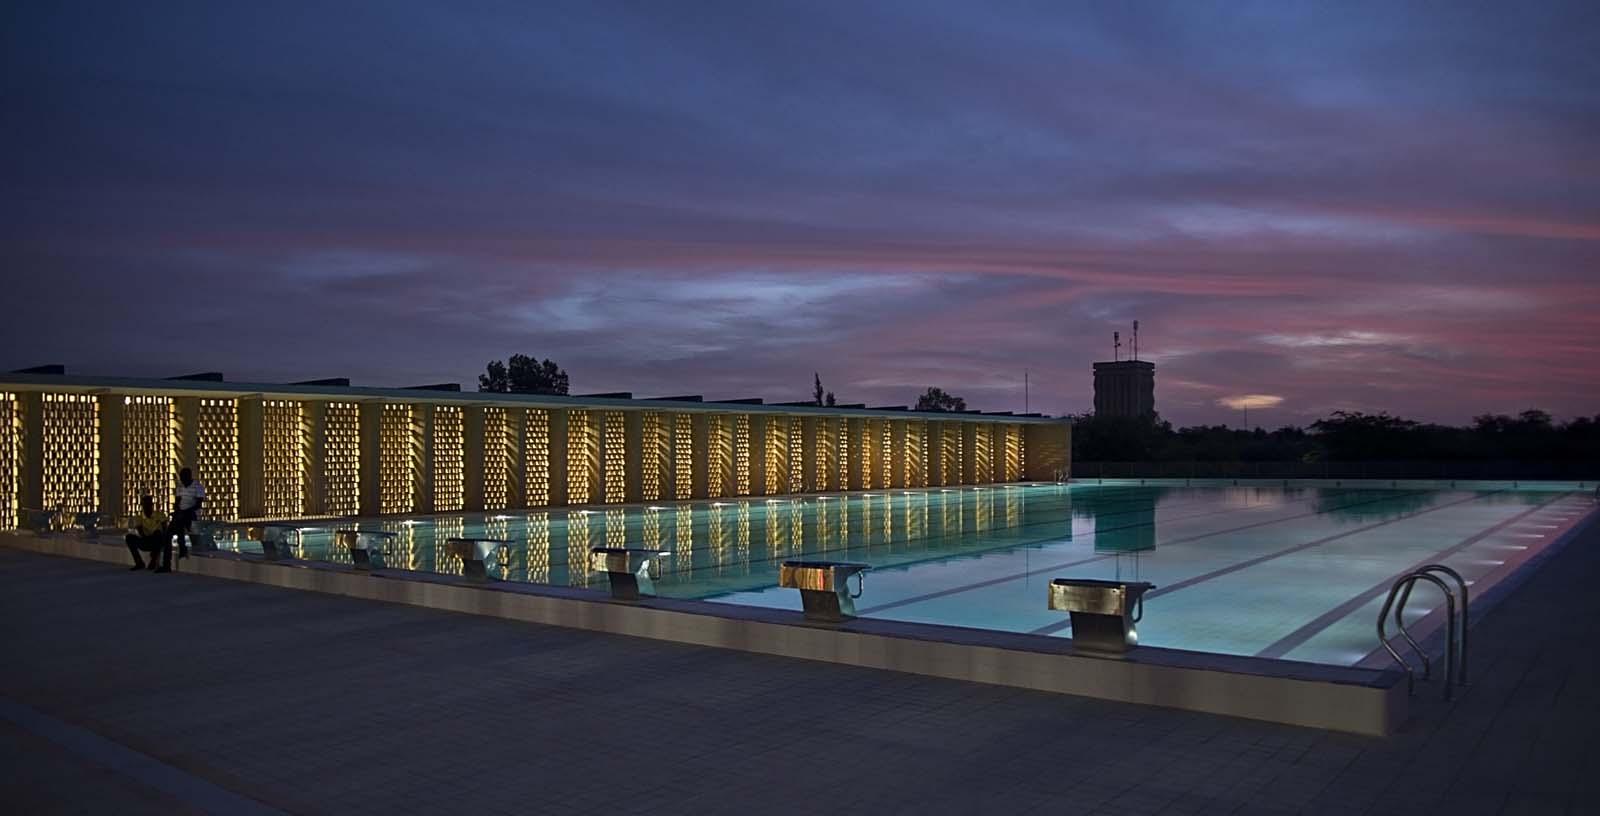 Saint_Louis-University-2-Architecture-IDOM-copyright-Francesco-Pinton